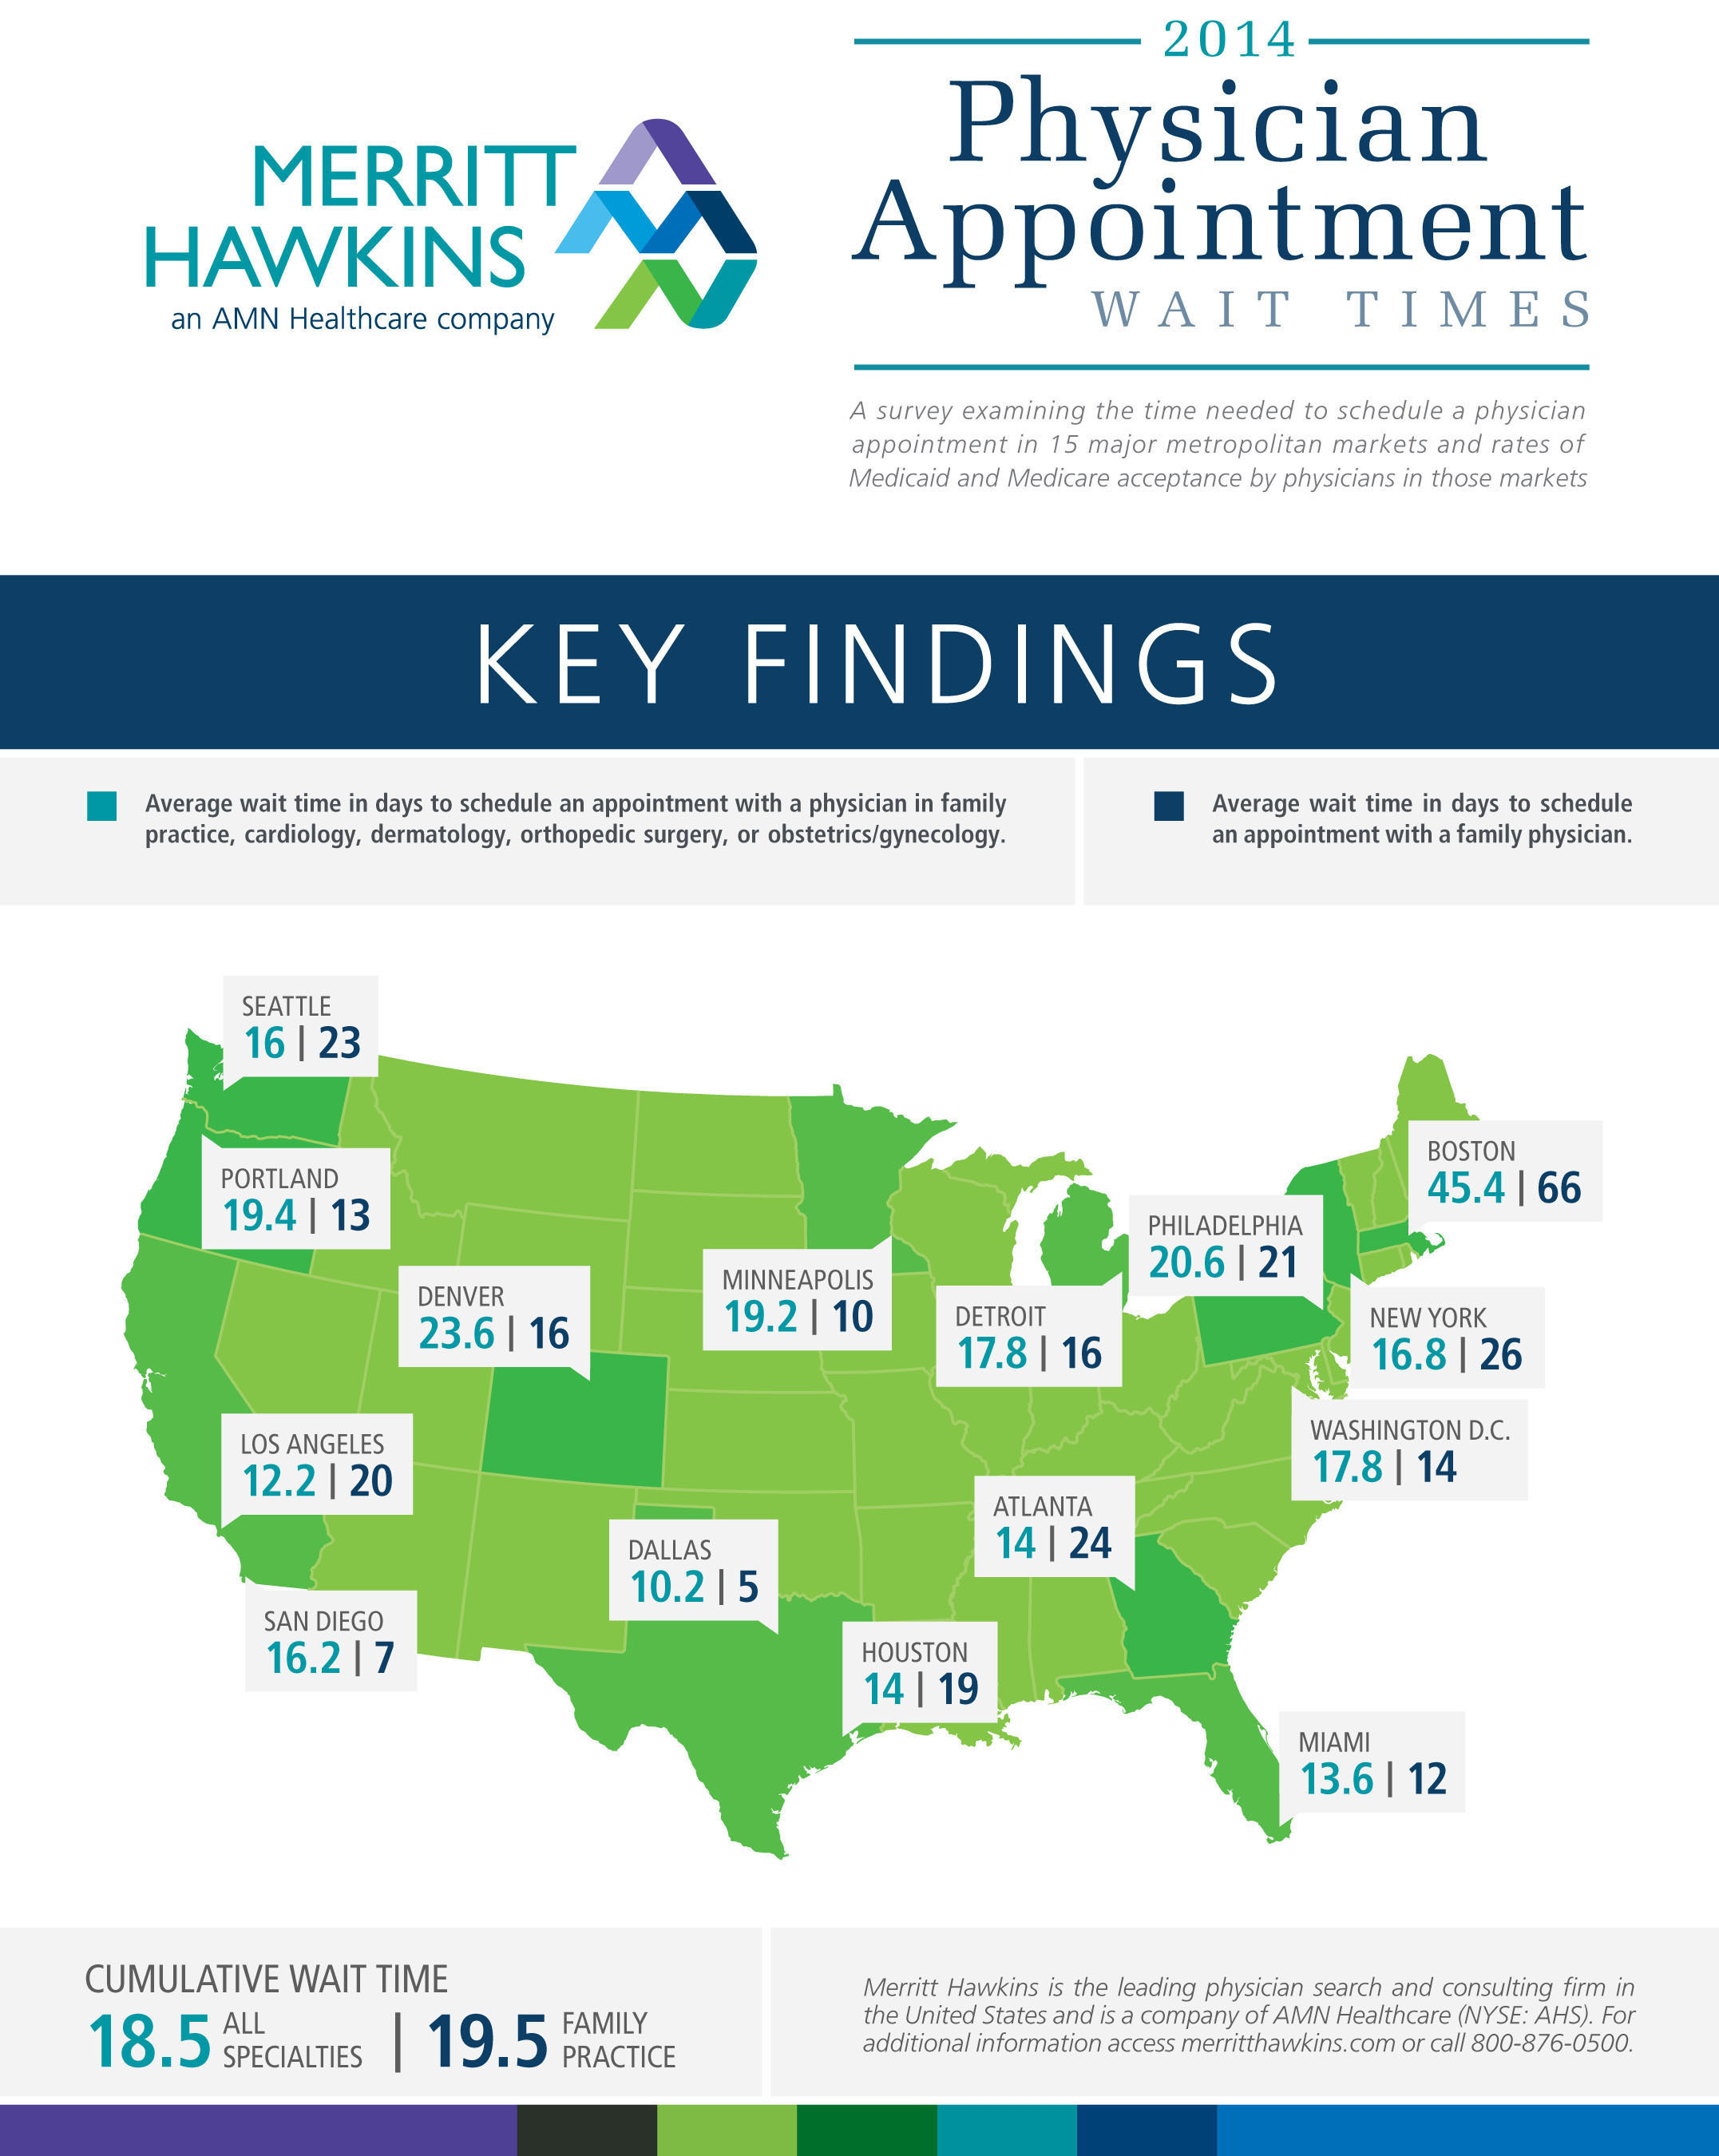 2014 Merritt Hawkins Physician Appointment Wait Times Survey Key Findings. (PRNewsFoto/Merritt Hawkins) ...